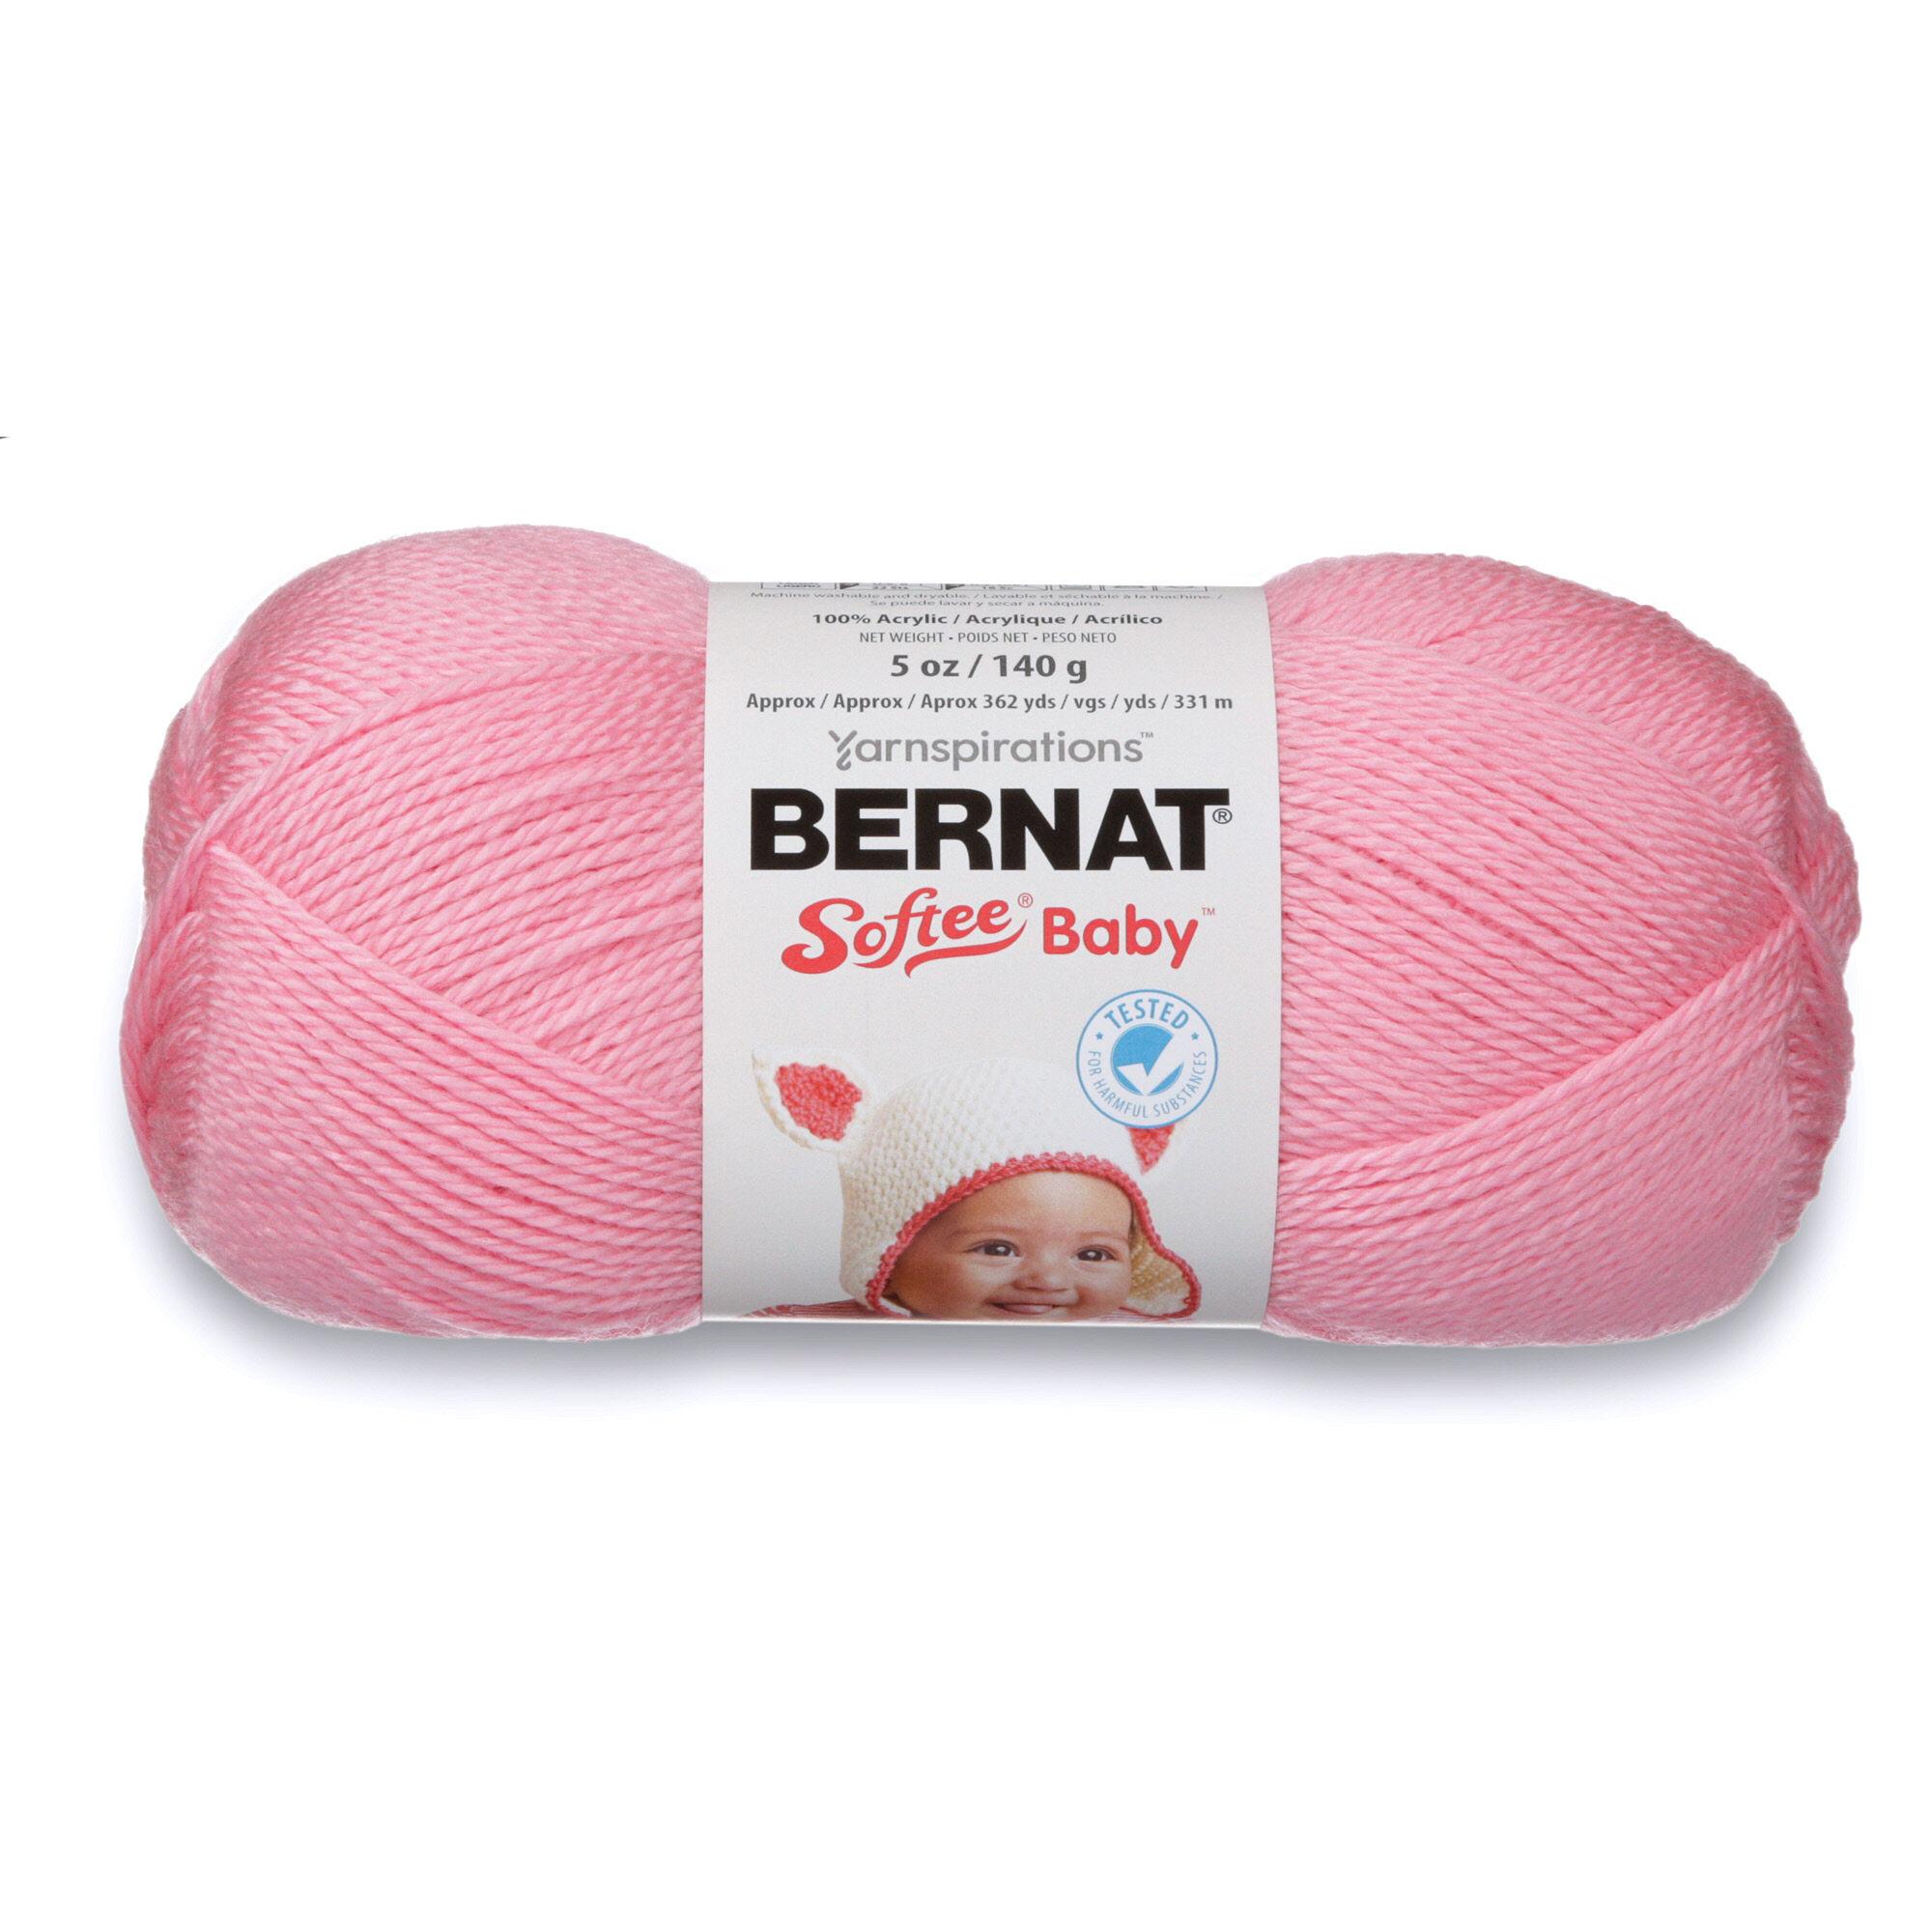 Bernat Softee Baby Yarn Prettiest Pink Yarnspirations